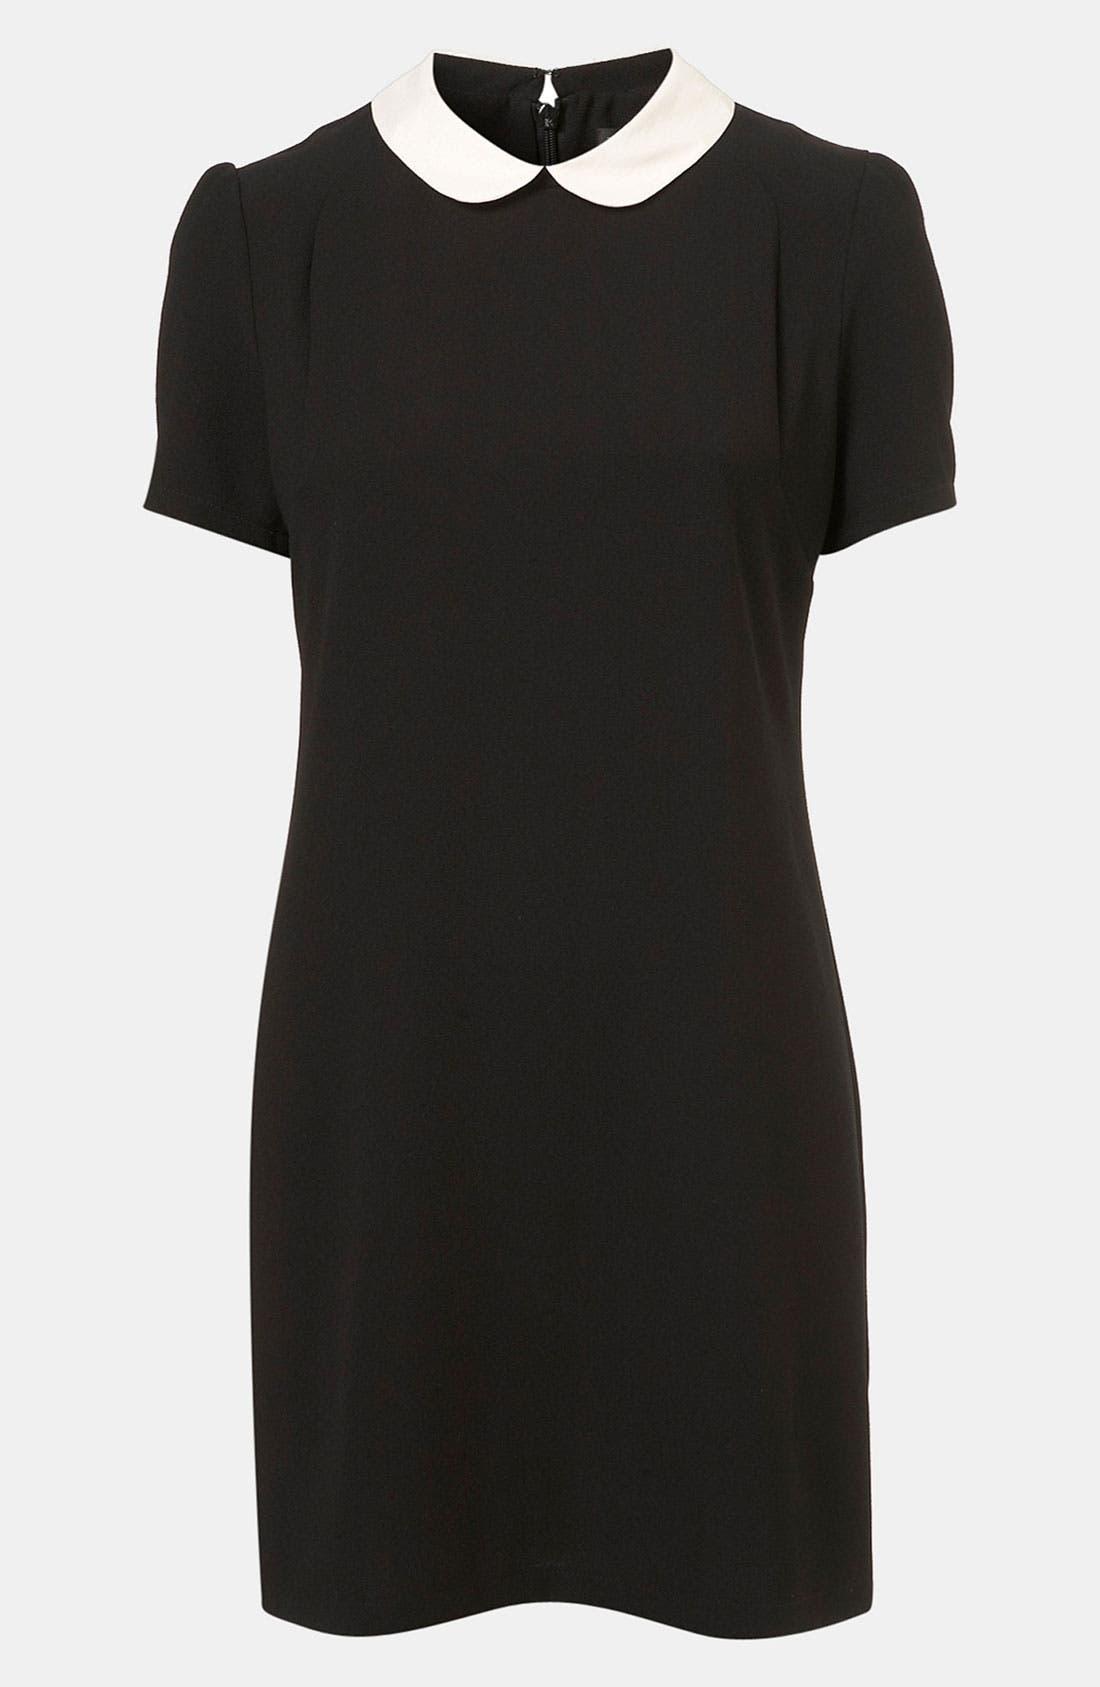 Main Image - Topshop Contrast Collar Shift Dress